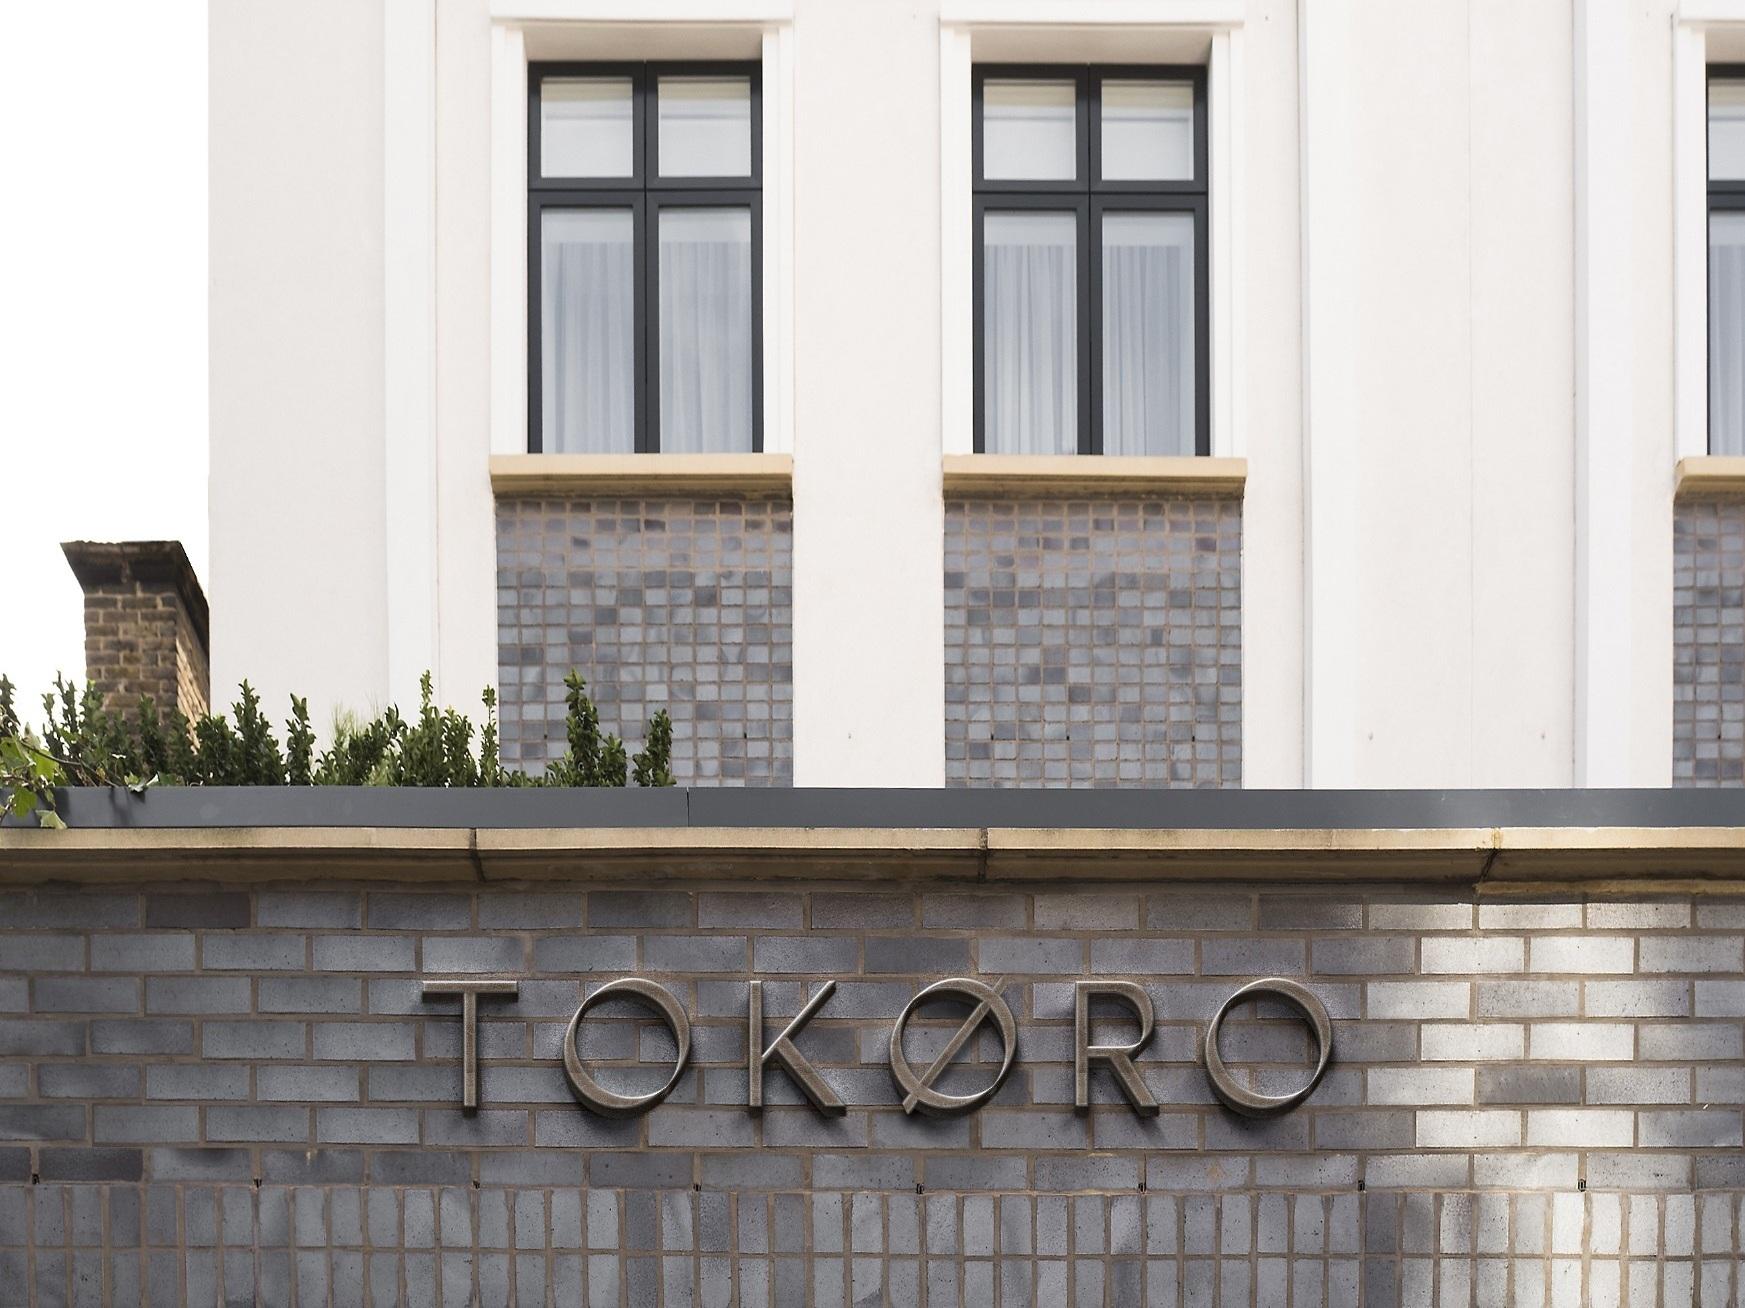 Tokoro_Signage.jpg